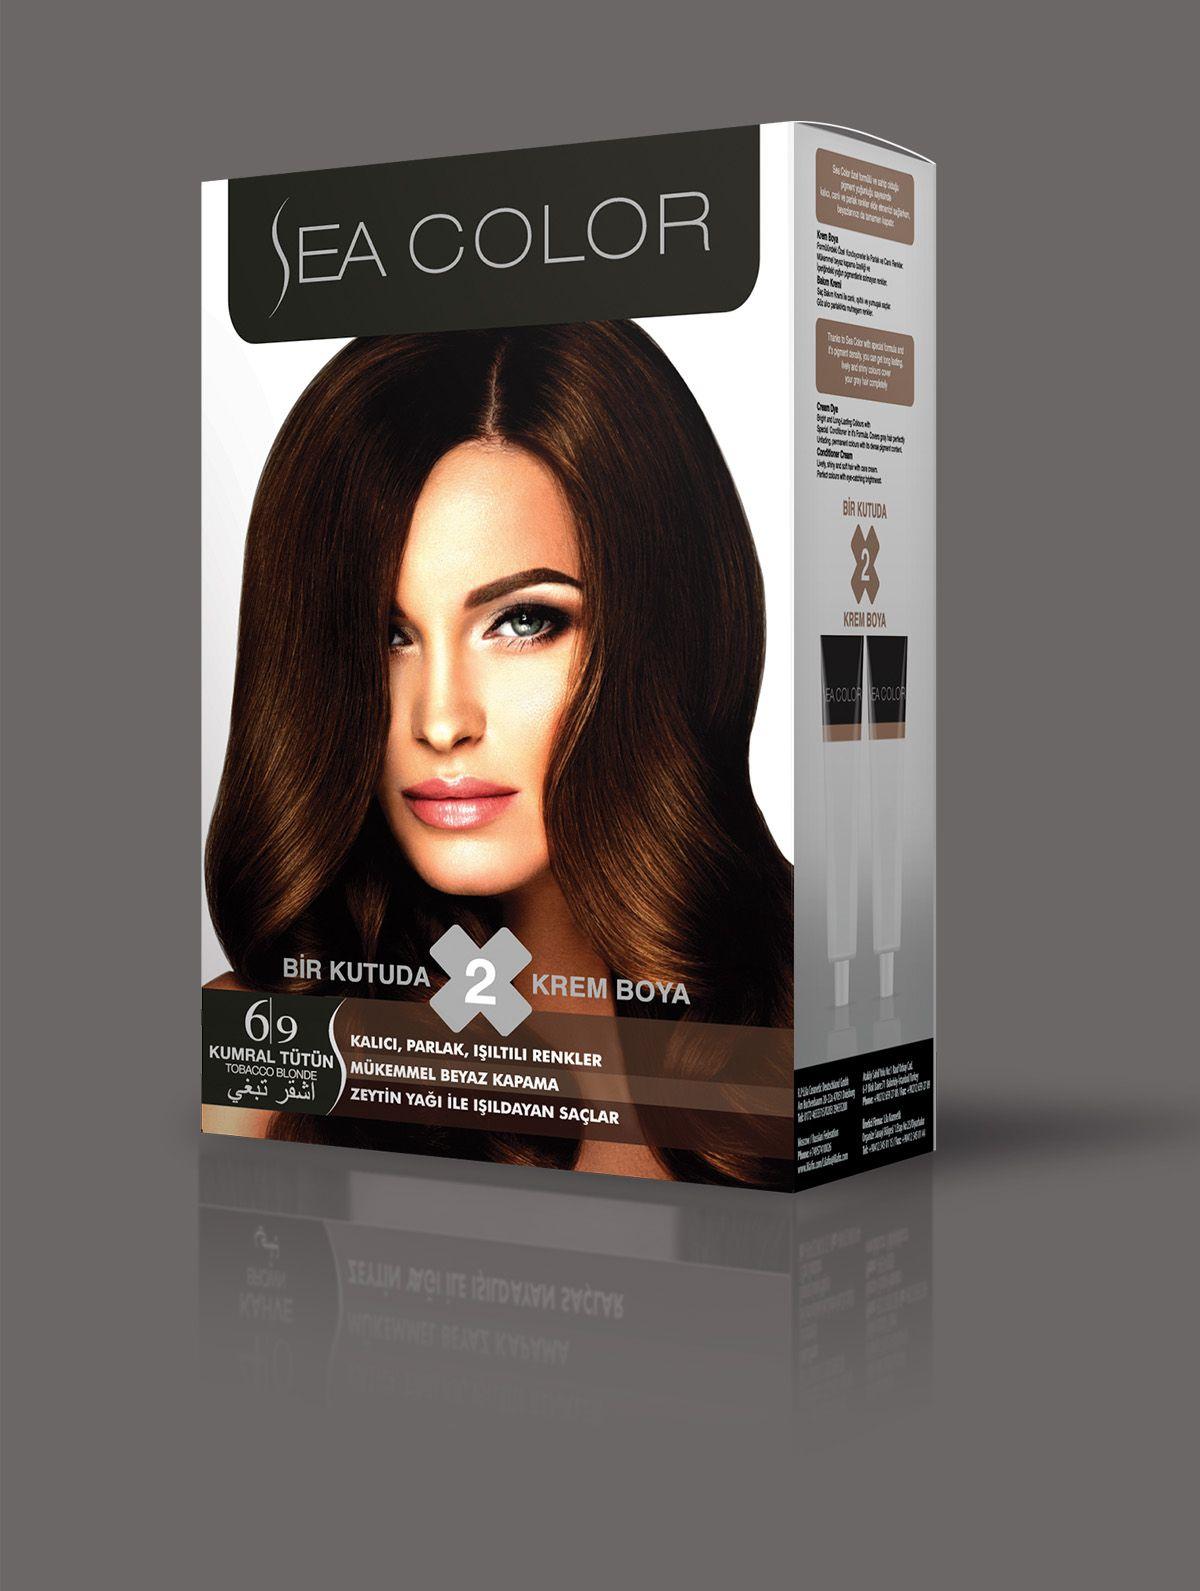 Sea Color Sac Boyasi 6 9 Kumral Tutun Sac Sac Boyasi Renkler